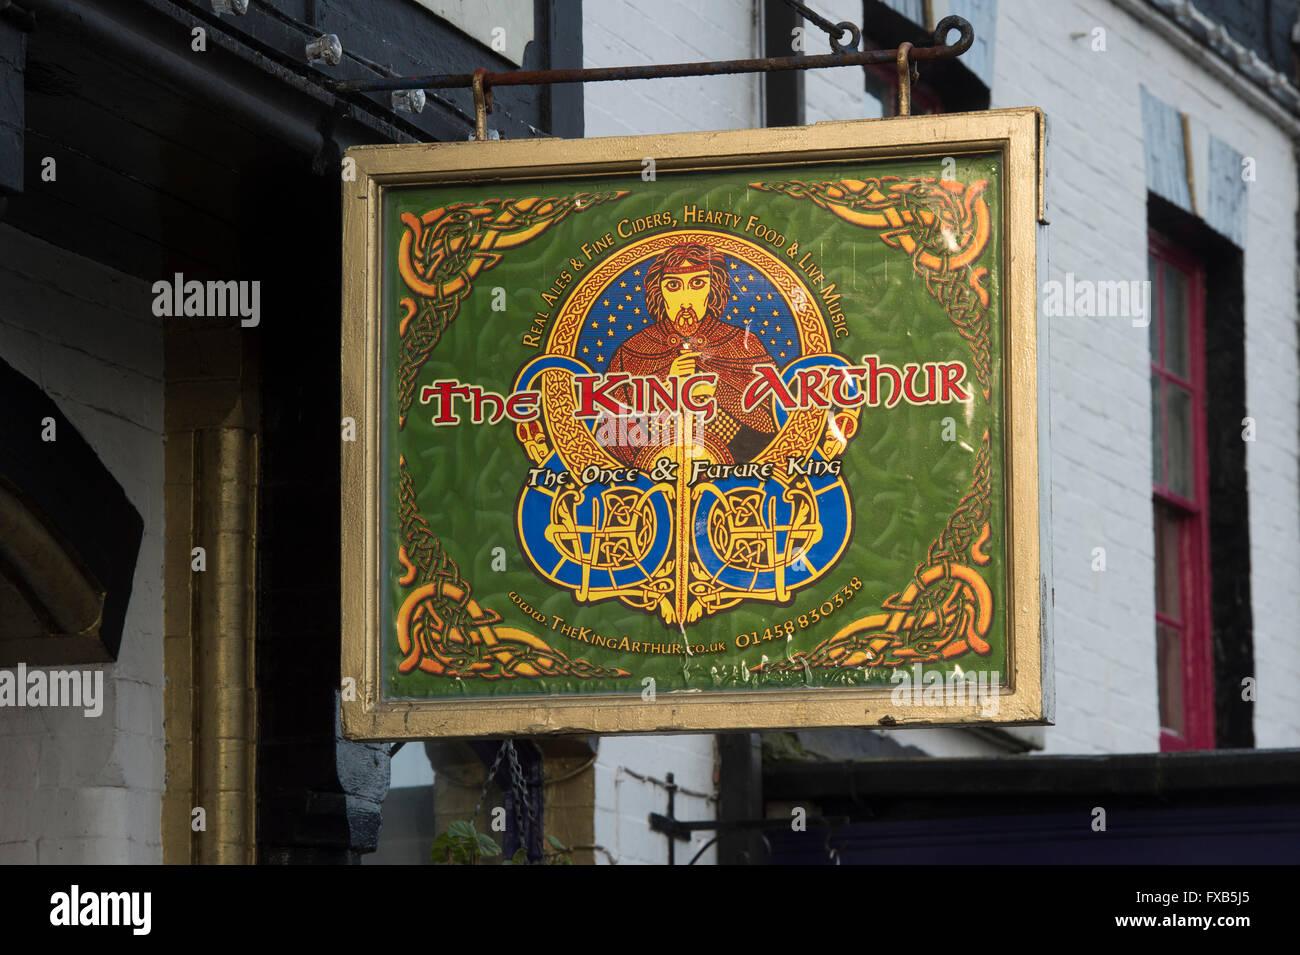 The King Arthur pub sign. Glastonbury, Somerset, England - Stock Image